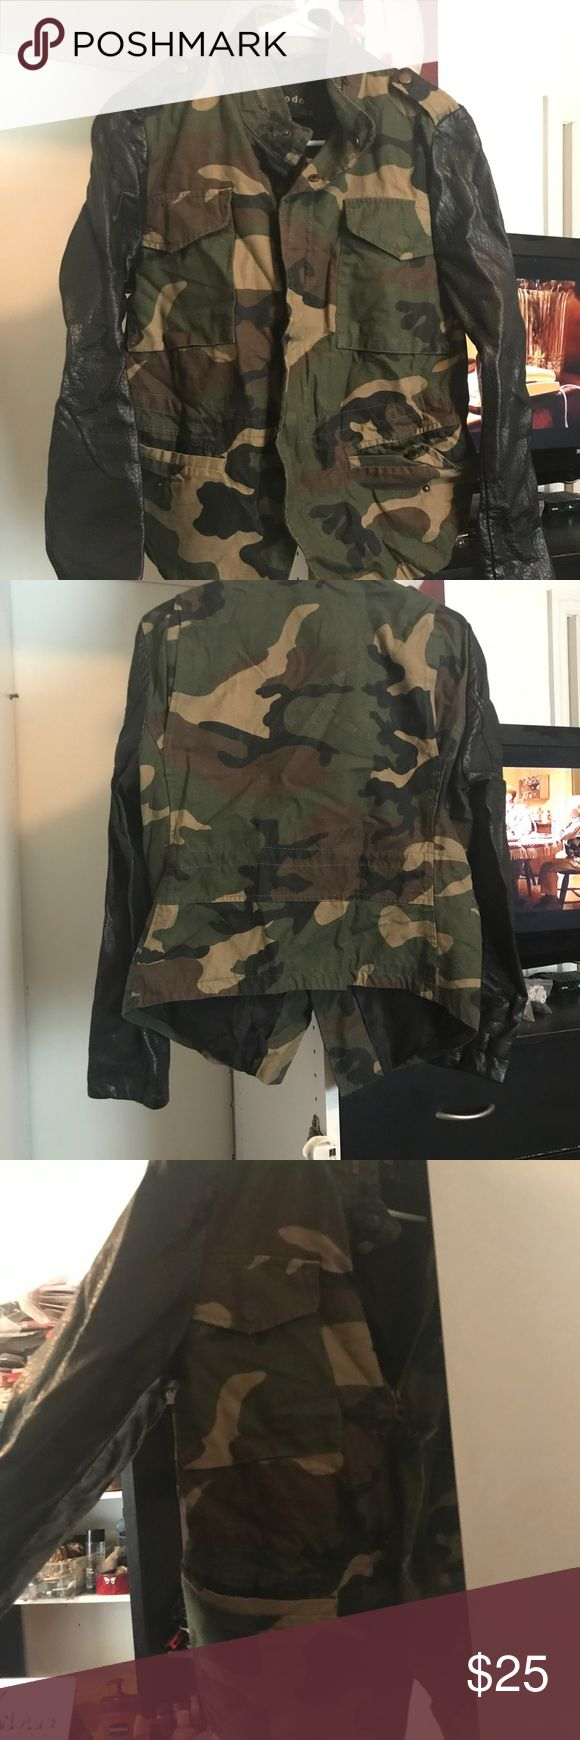 Army Leather Sleeve Jacket Super cute army fatigue leather sleeve jacket. Perfect for fall. Sz. L Jackets & Coats Utility Jackets